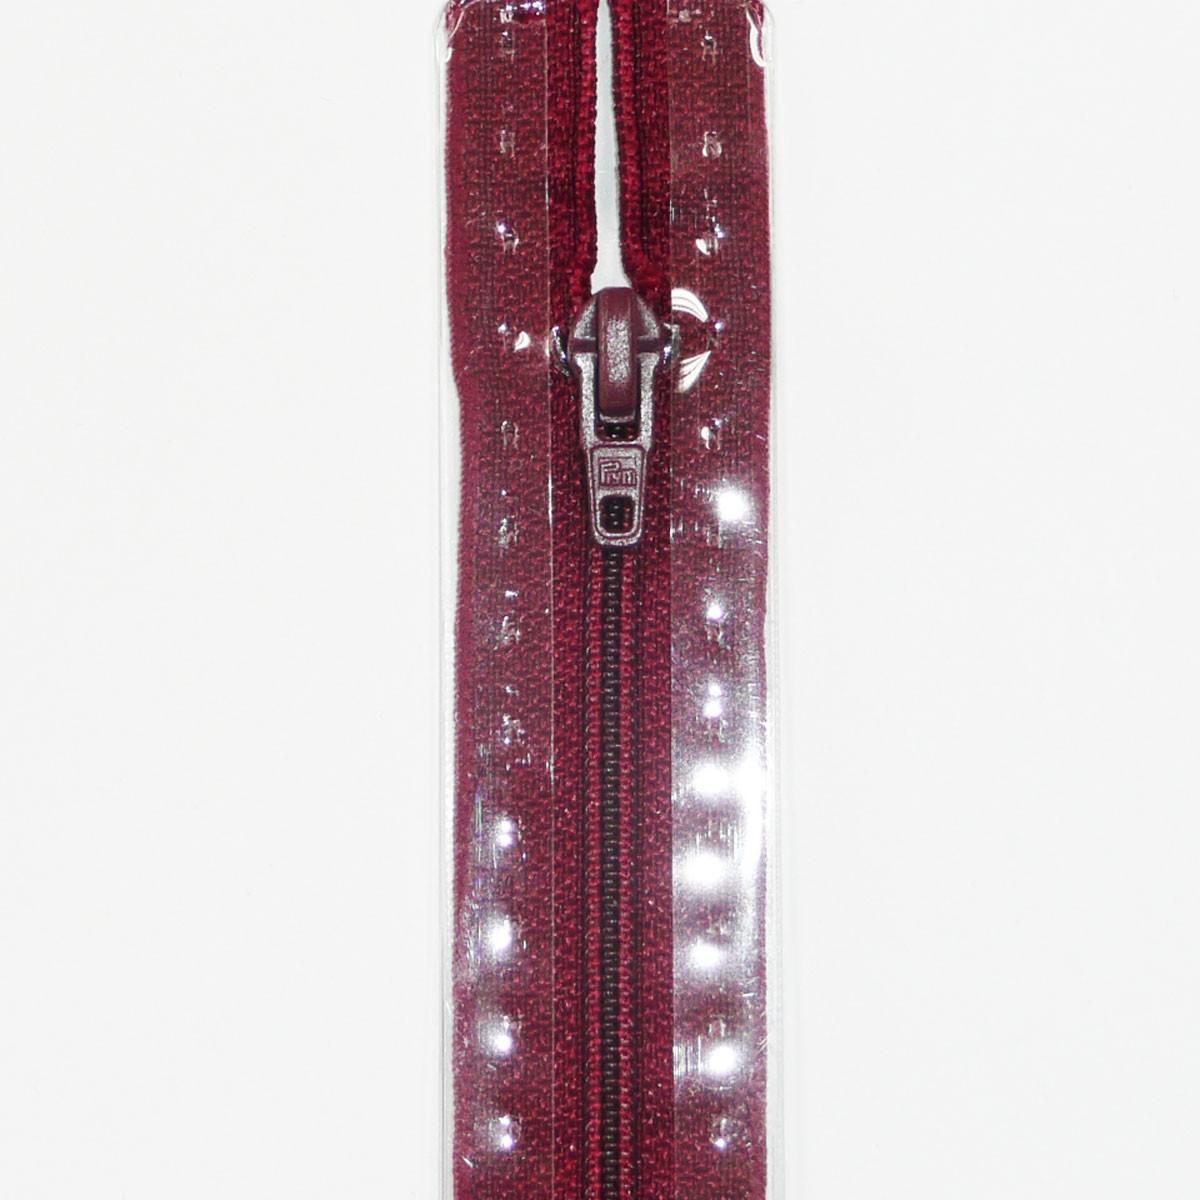 RV S1 Typ 0 ut 20 cm Fla burgund